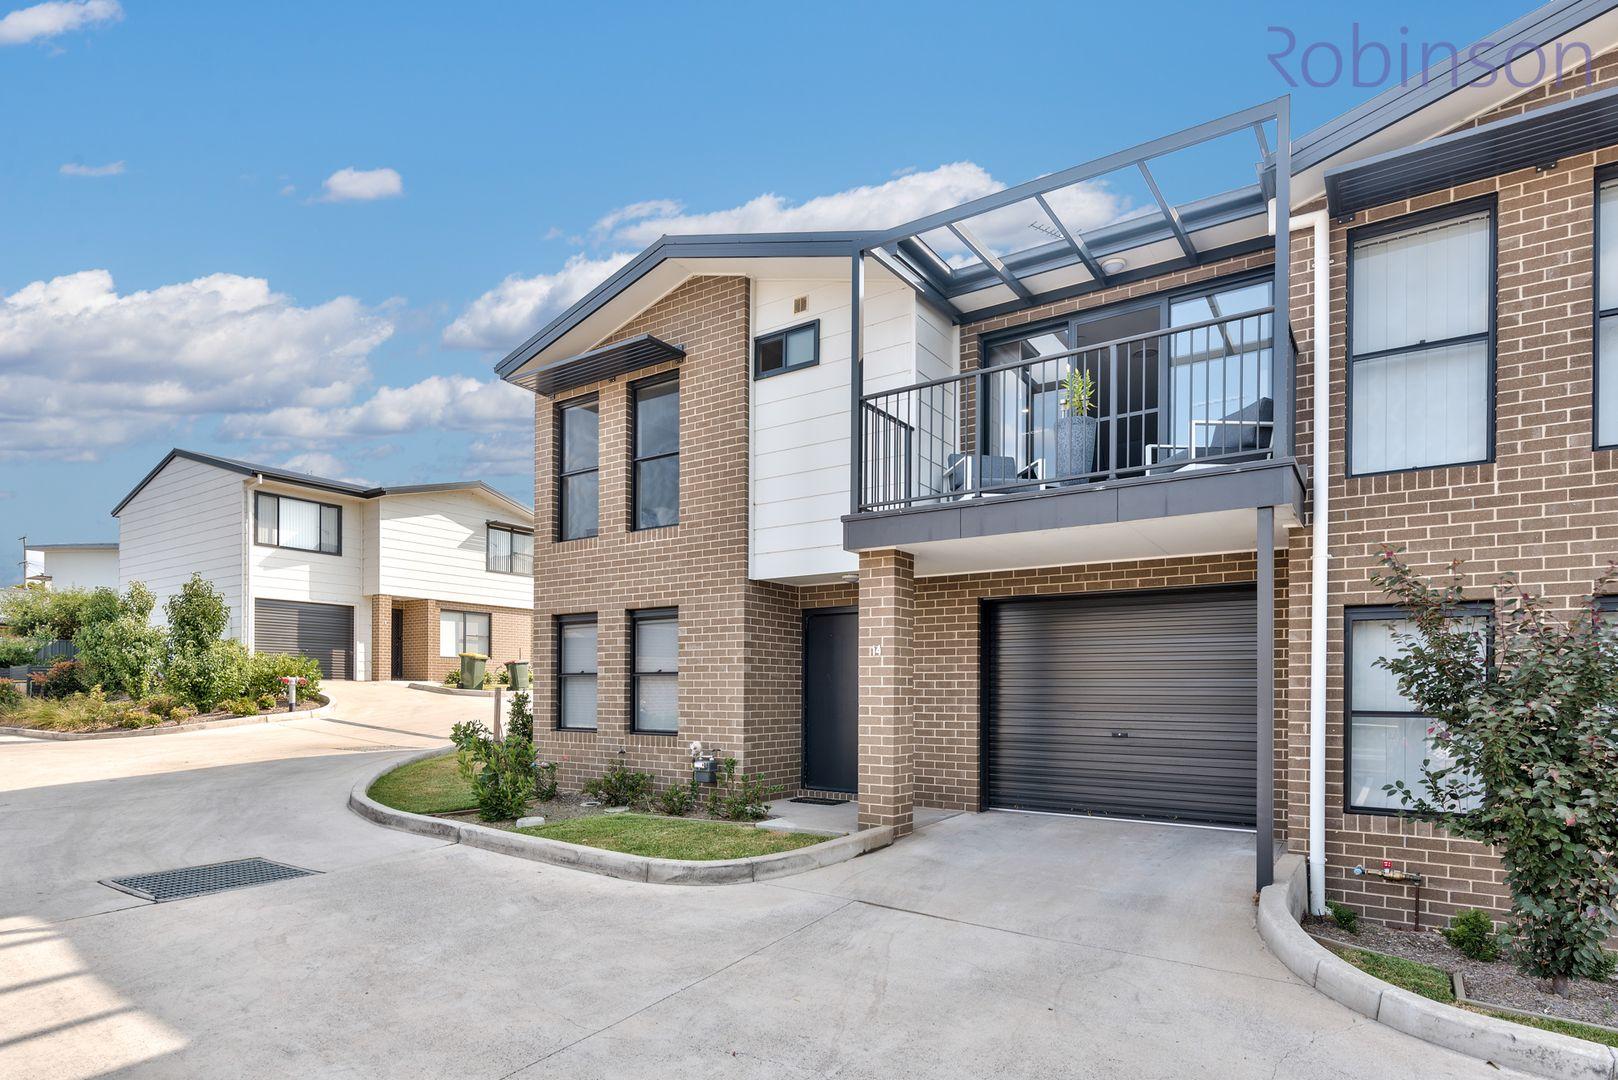 14/43 Mawson Street, Shortland NSW 2307, Image 0